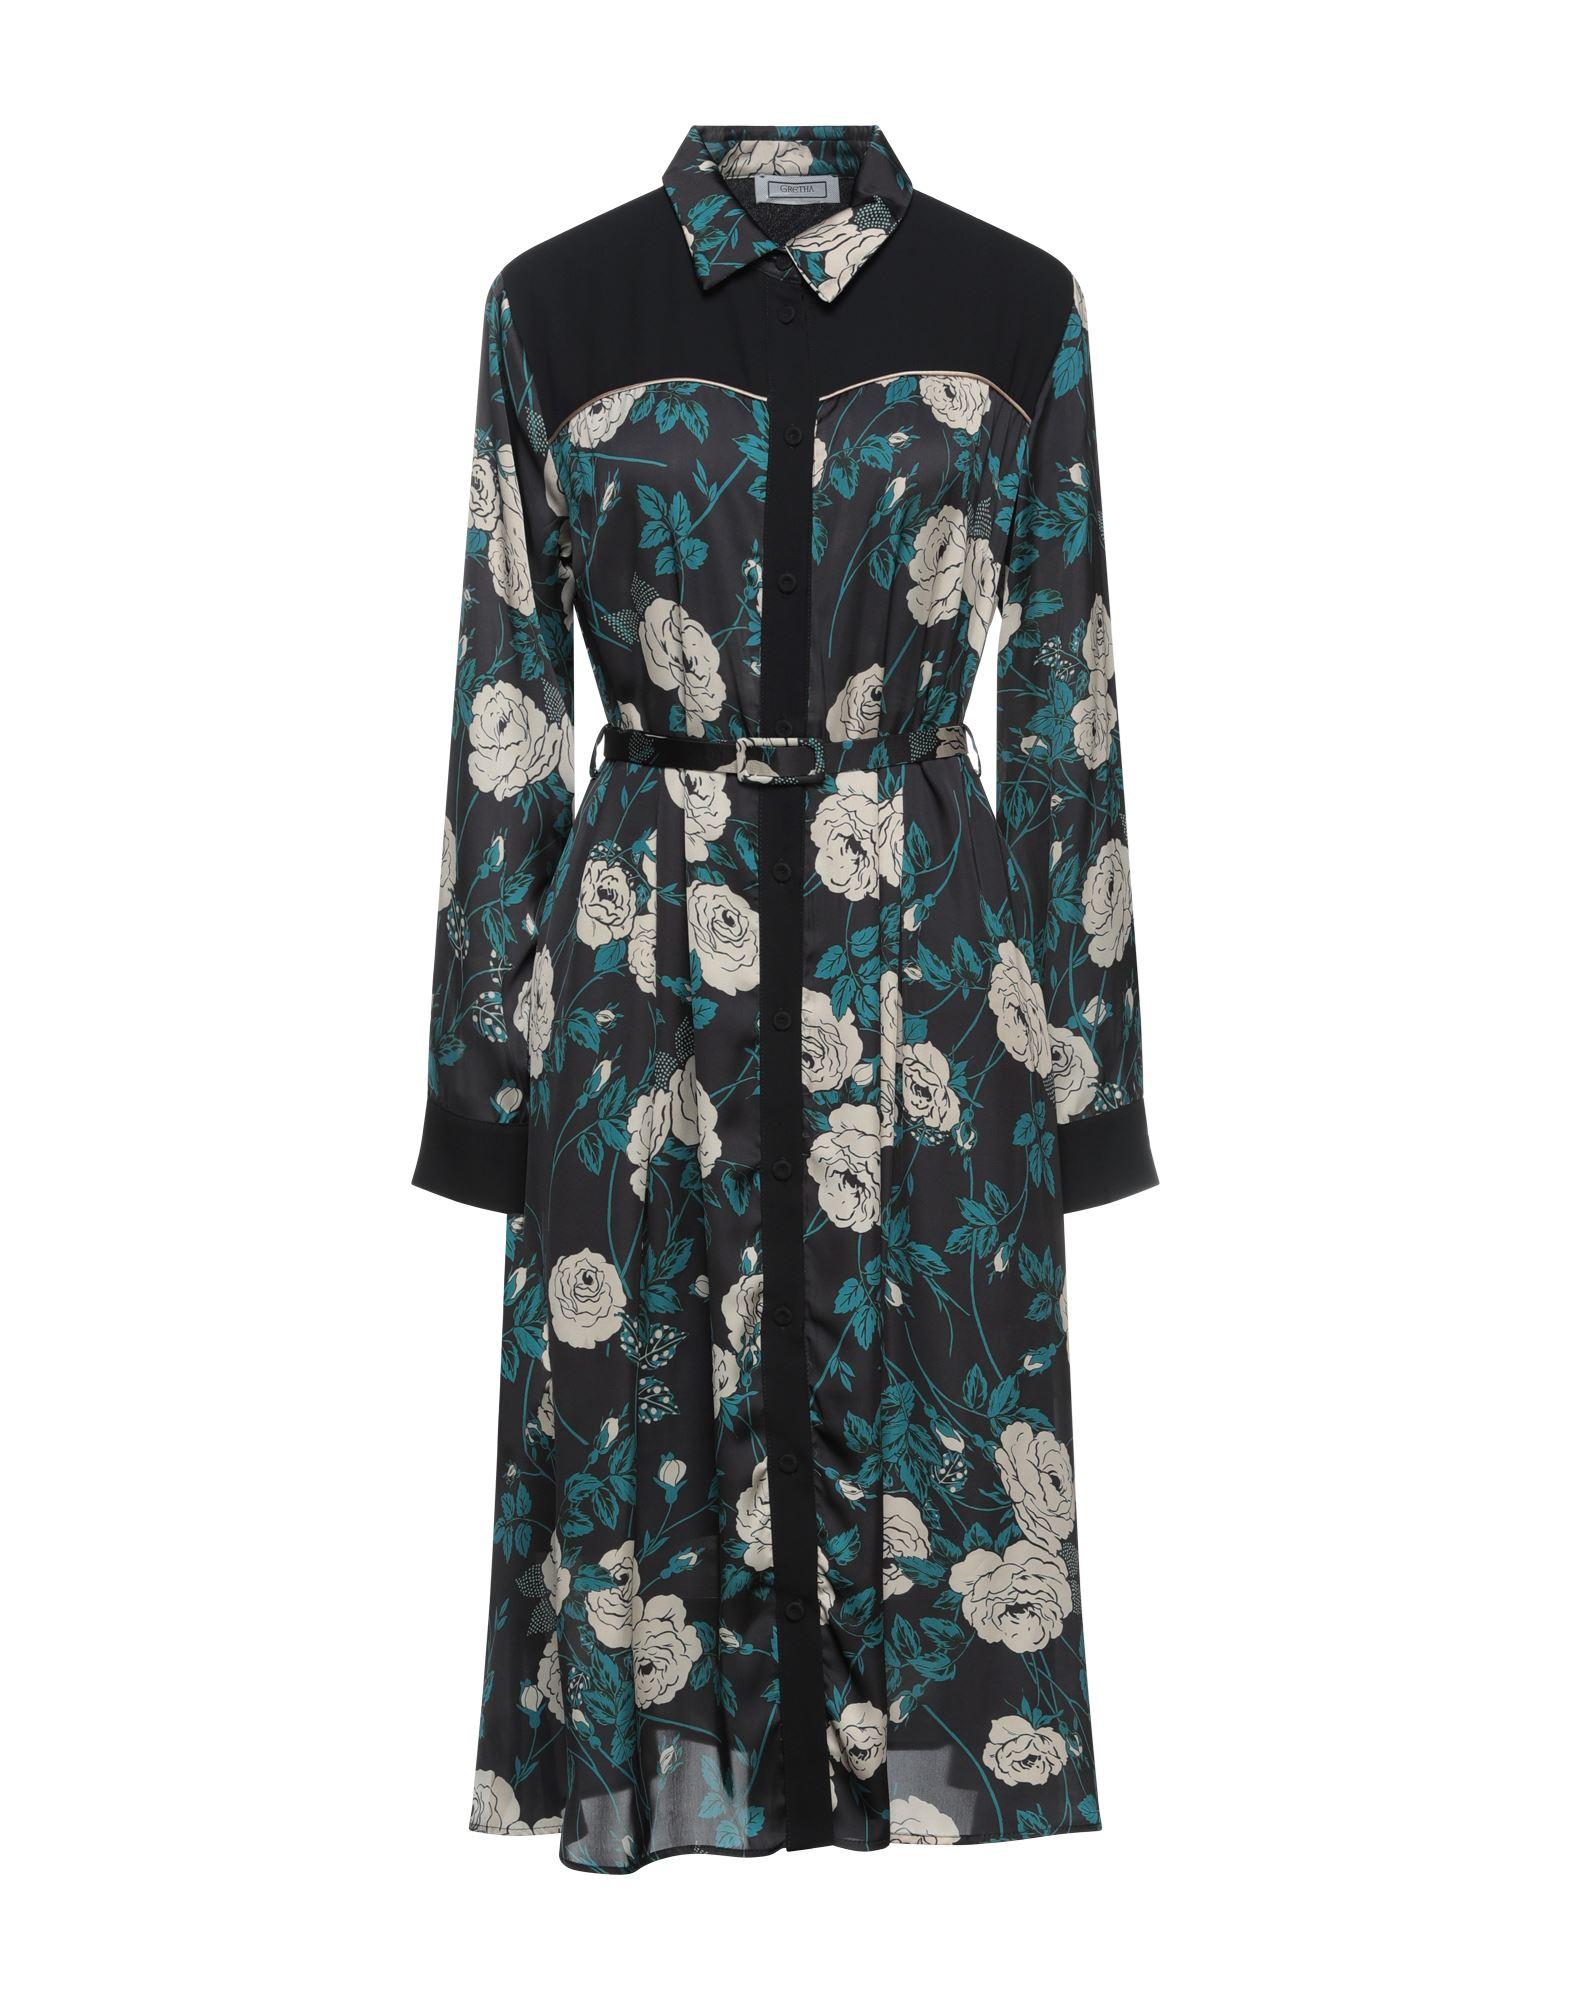 gretha milano блузка GRETHA Milano Платье миди